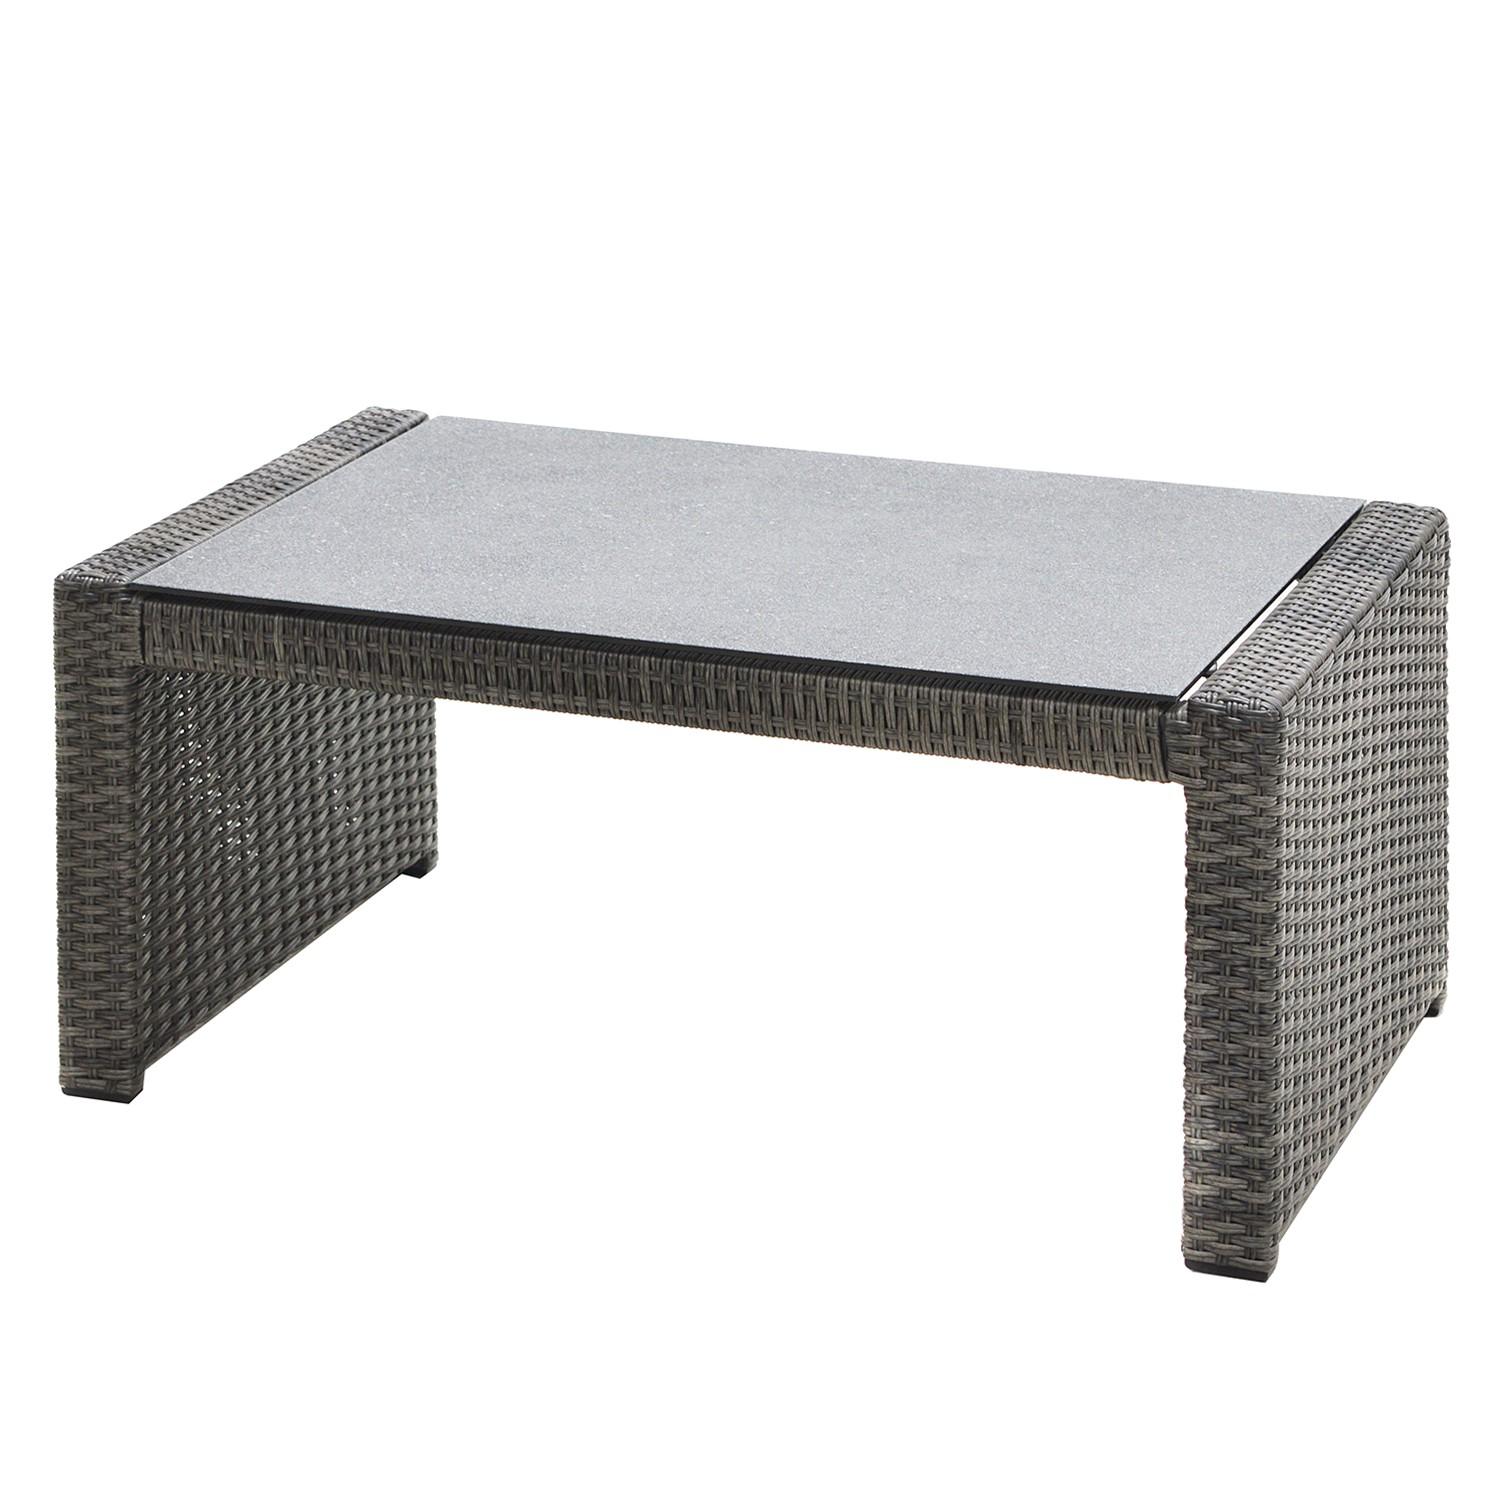 Table de jardin Rocking - Polyrotin - Marron gris / Anthracite, Ploß